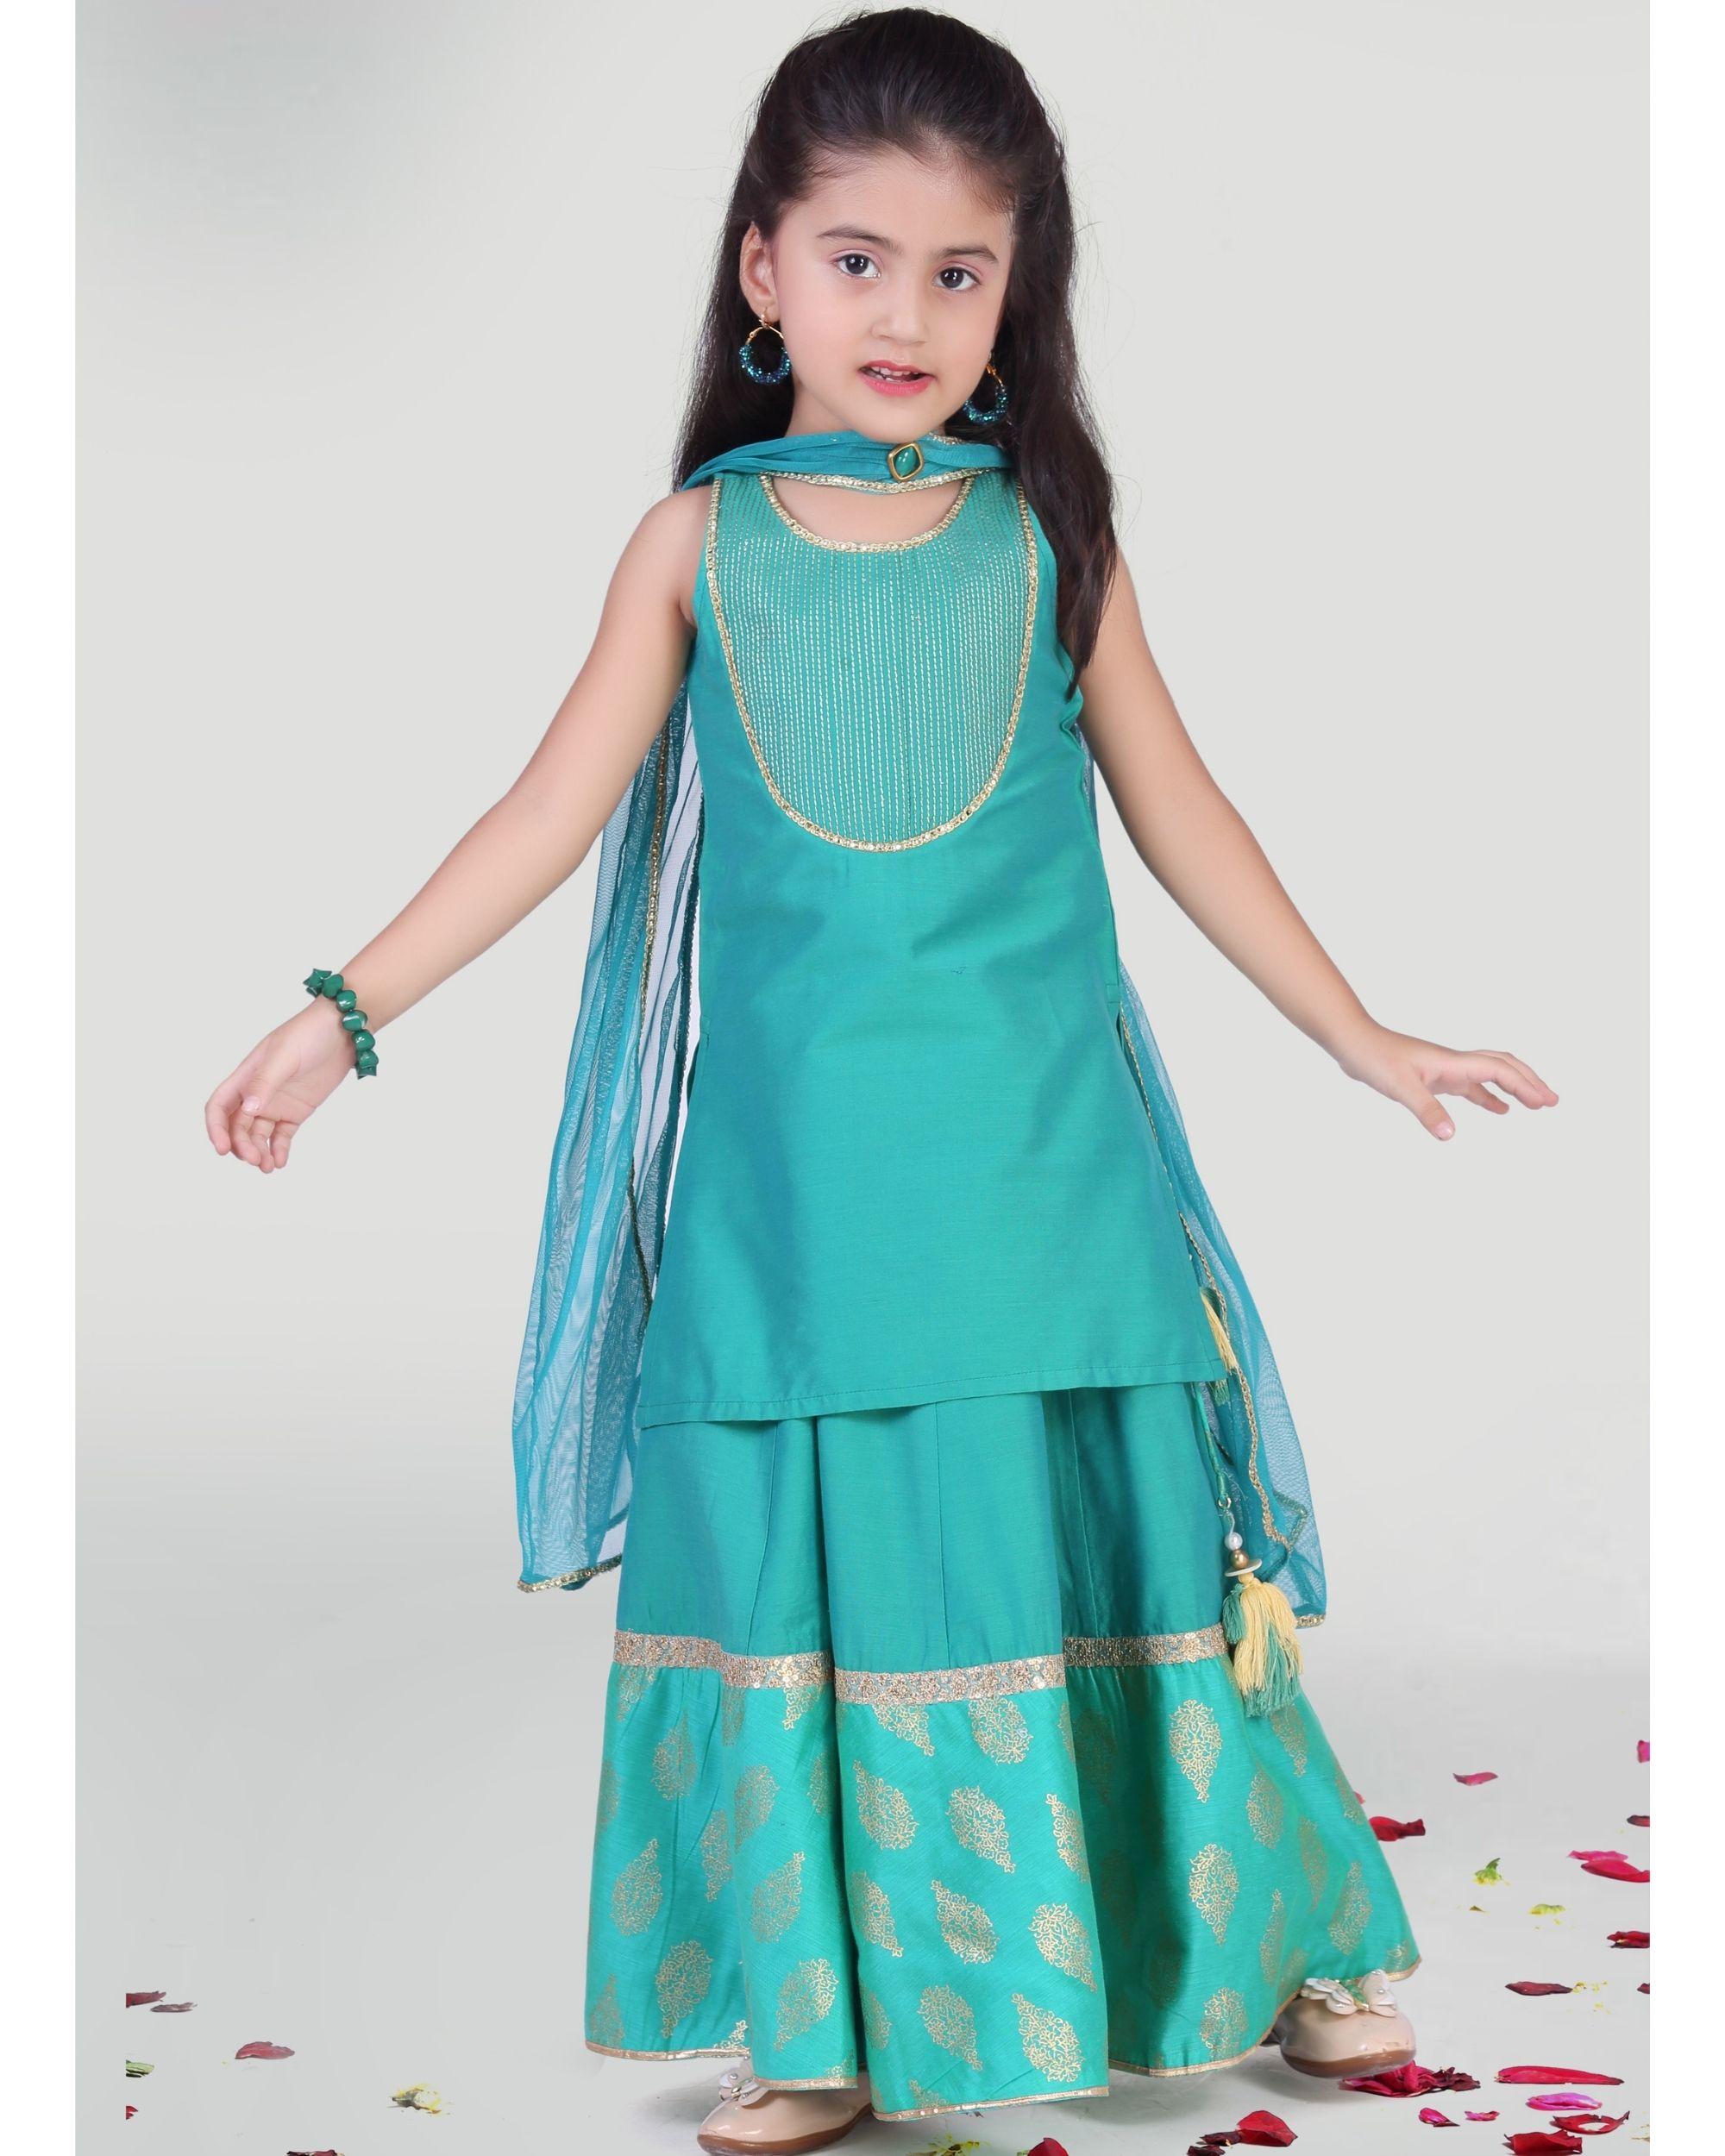 Aqua green kurta with skirt and dupatta - set of three